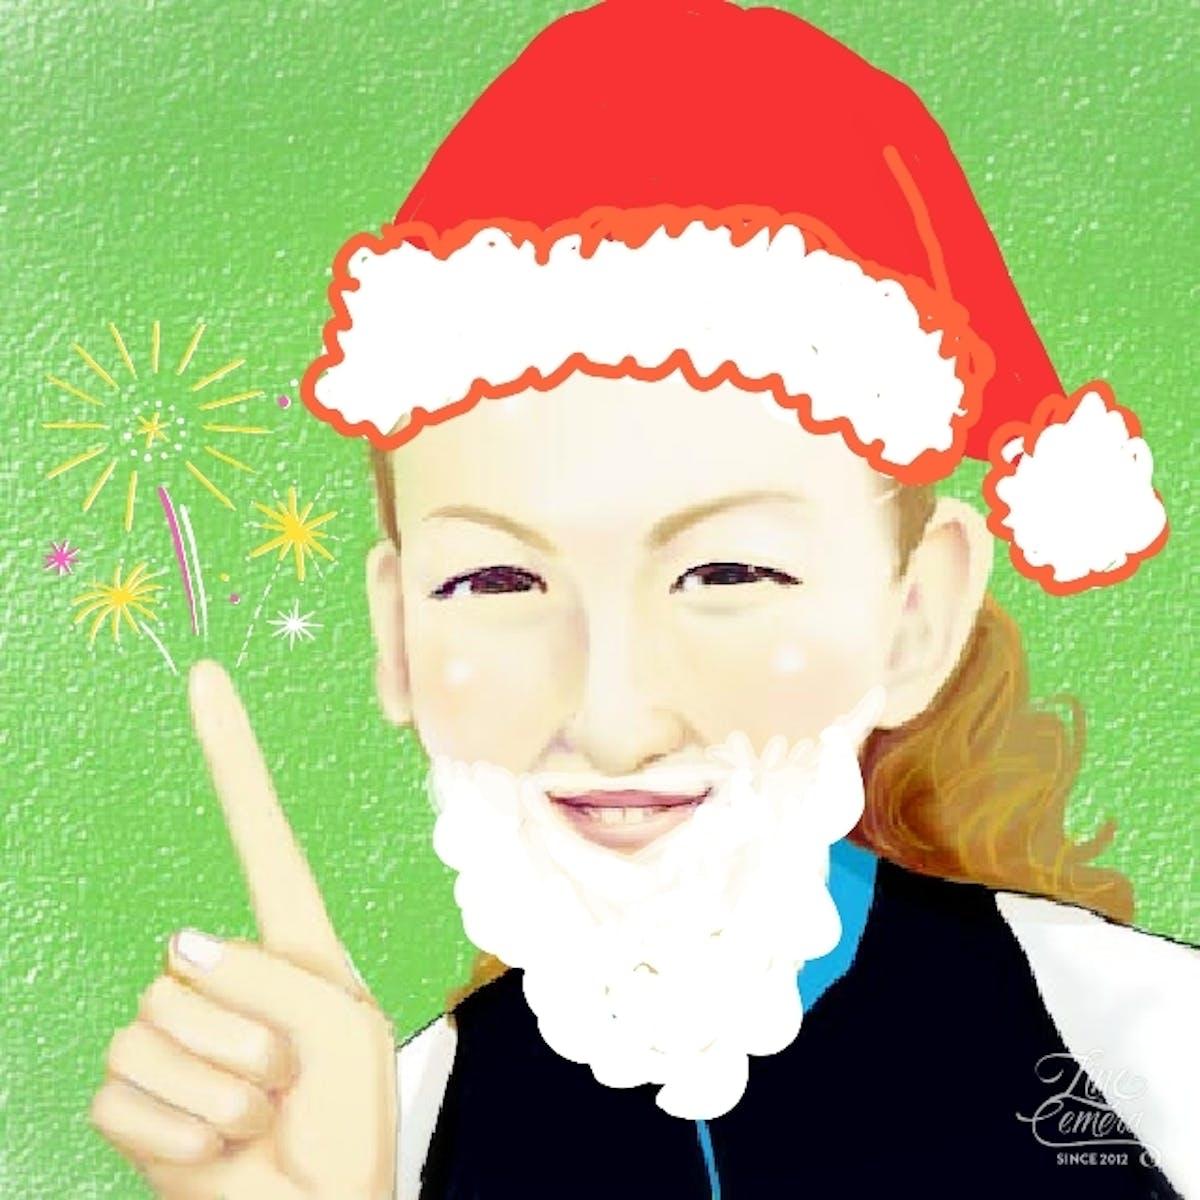 16-11-30-22-28-12-599_deco.jpg